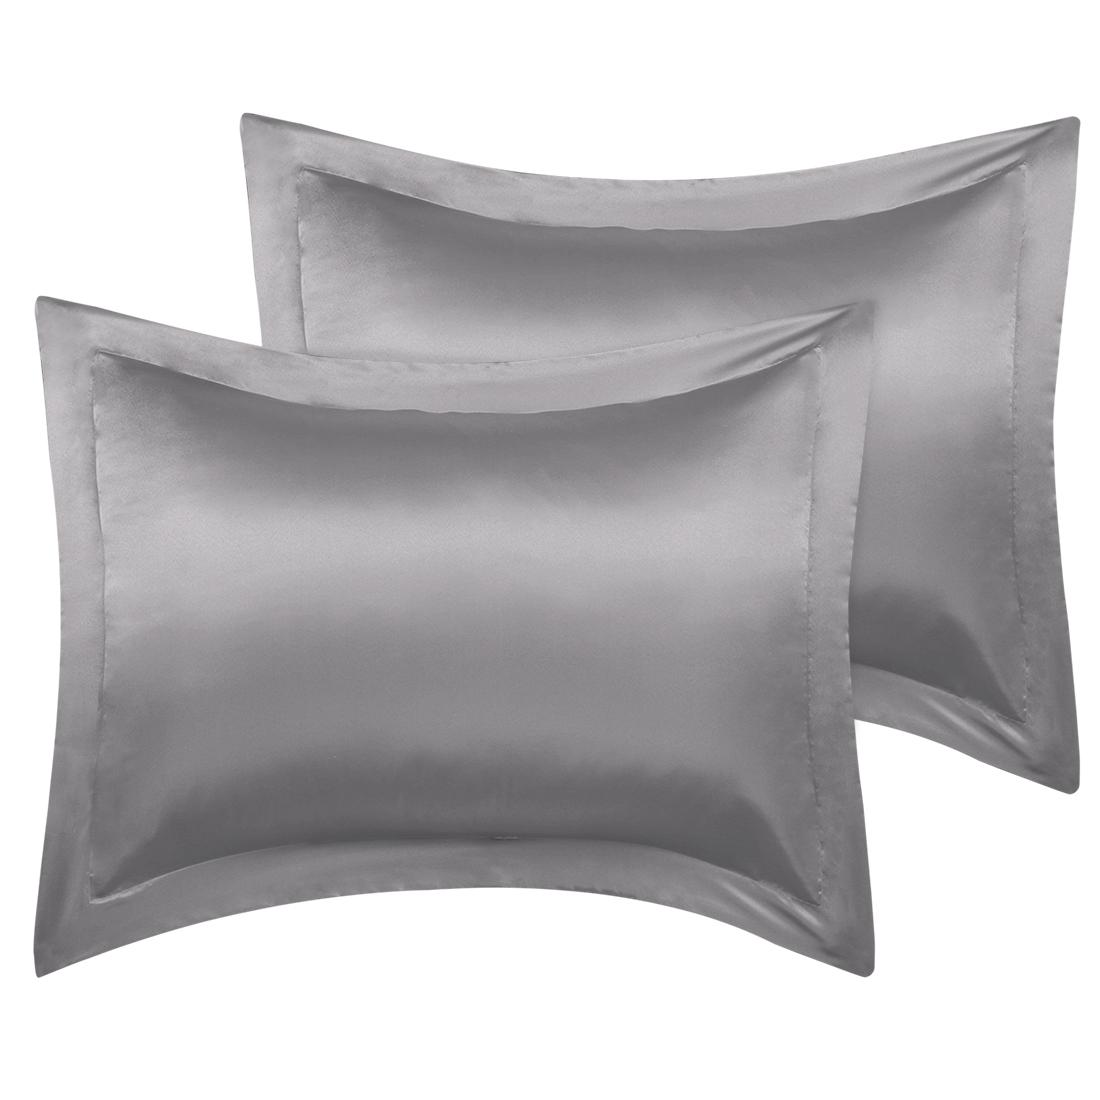 2 Pcs Grey Pillow Shams Satin Pillow Cases Boudoir Oxford Pillowcases